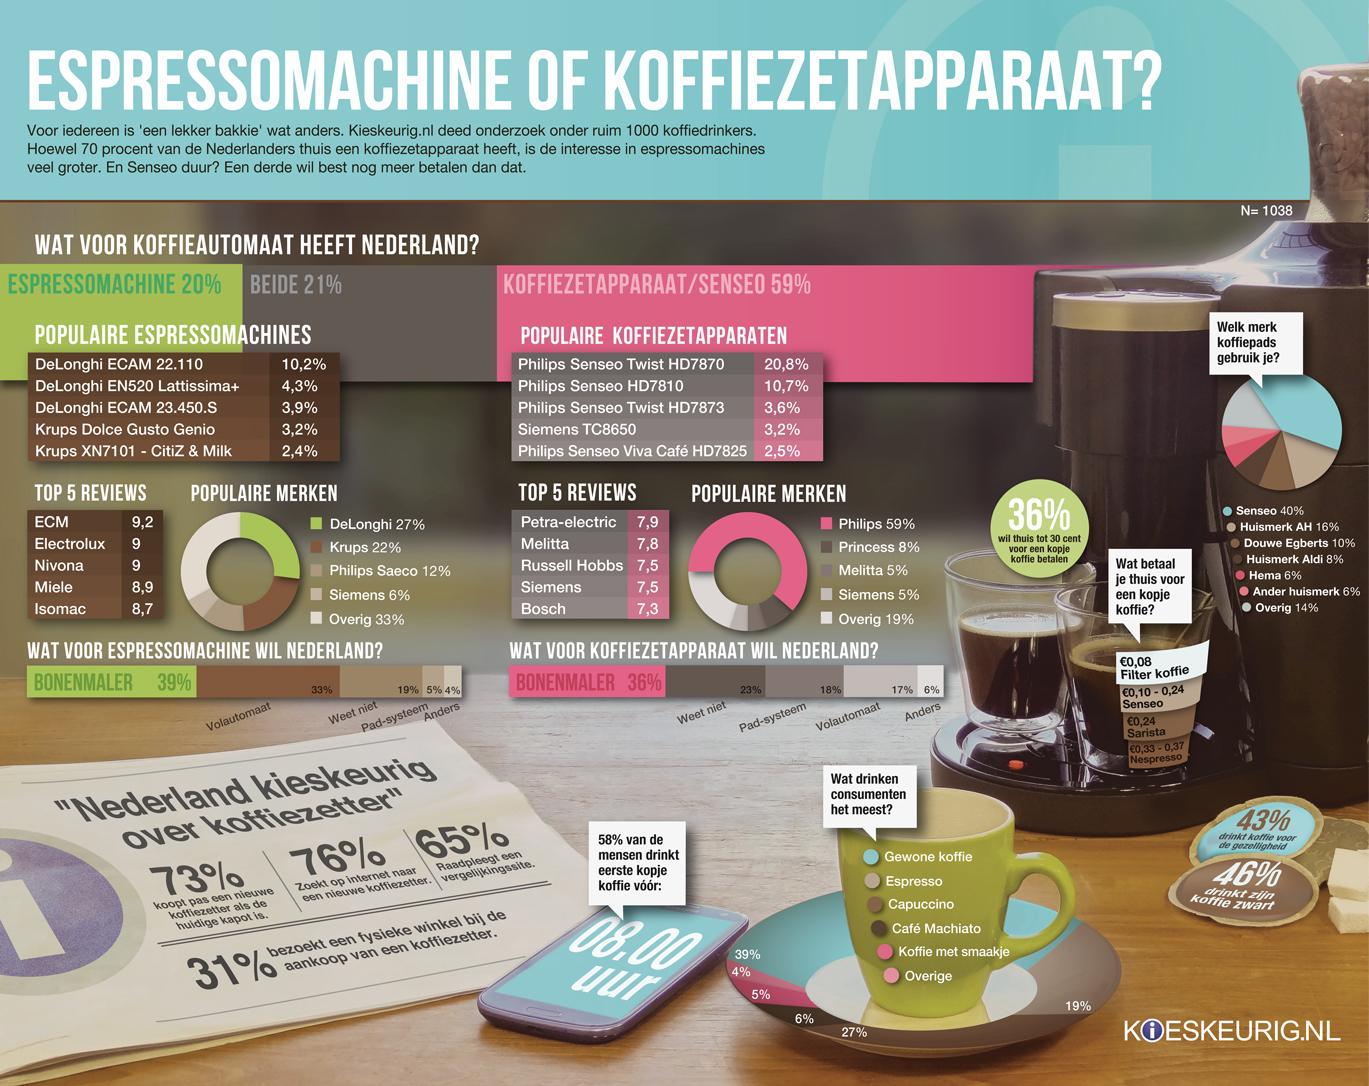 infographic espressomachine of koffiezetapparaat